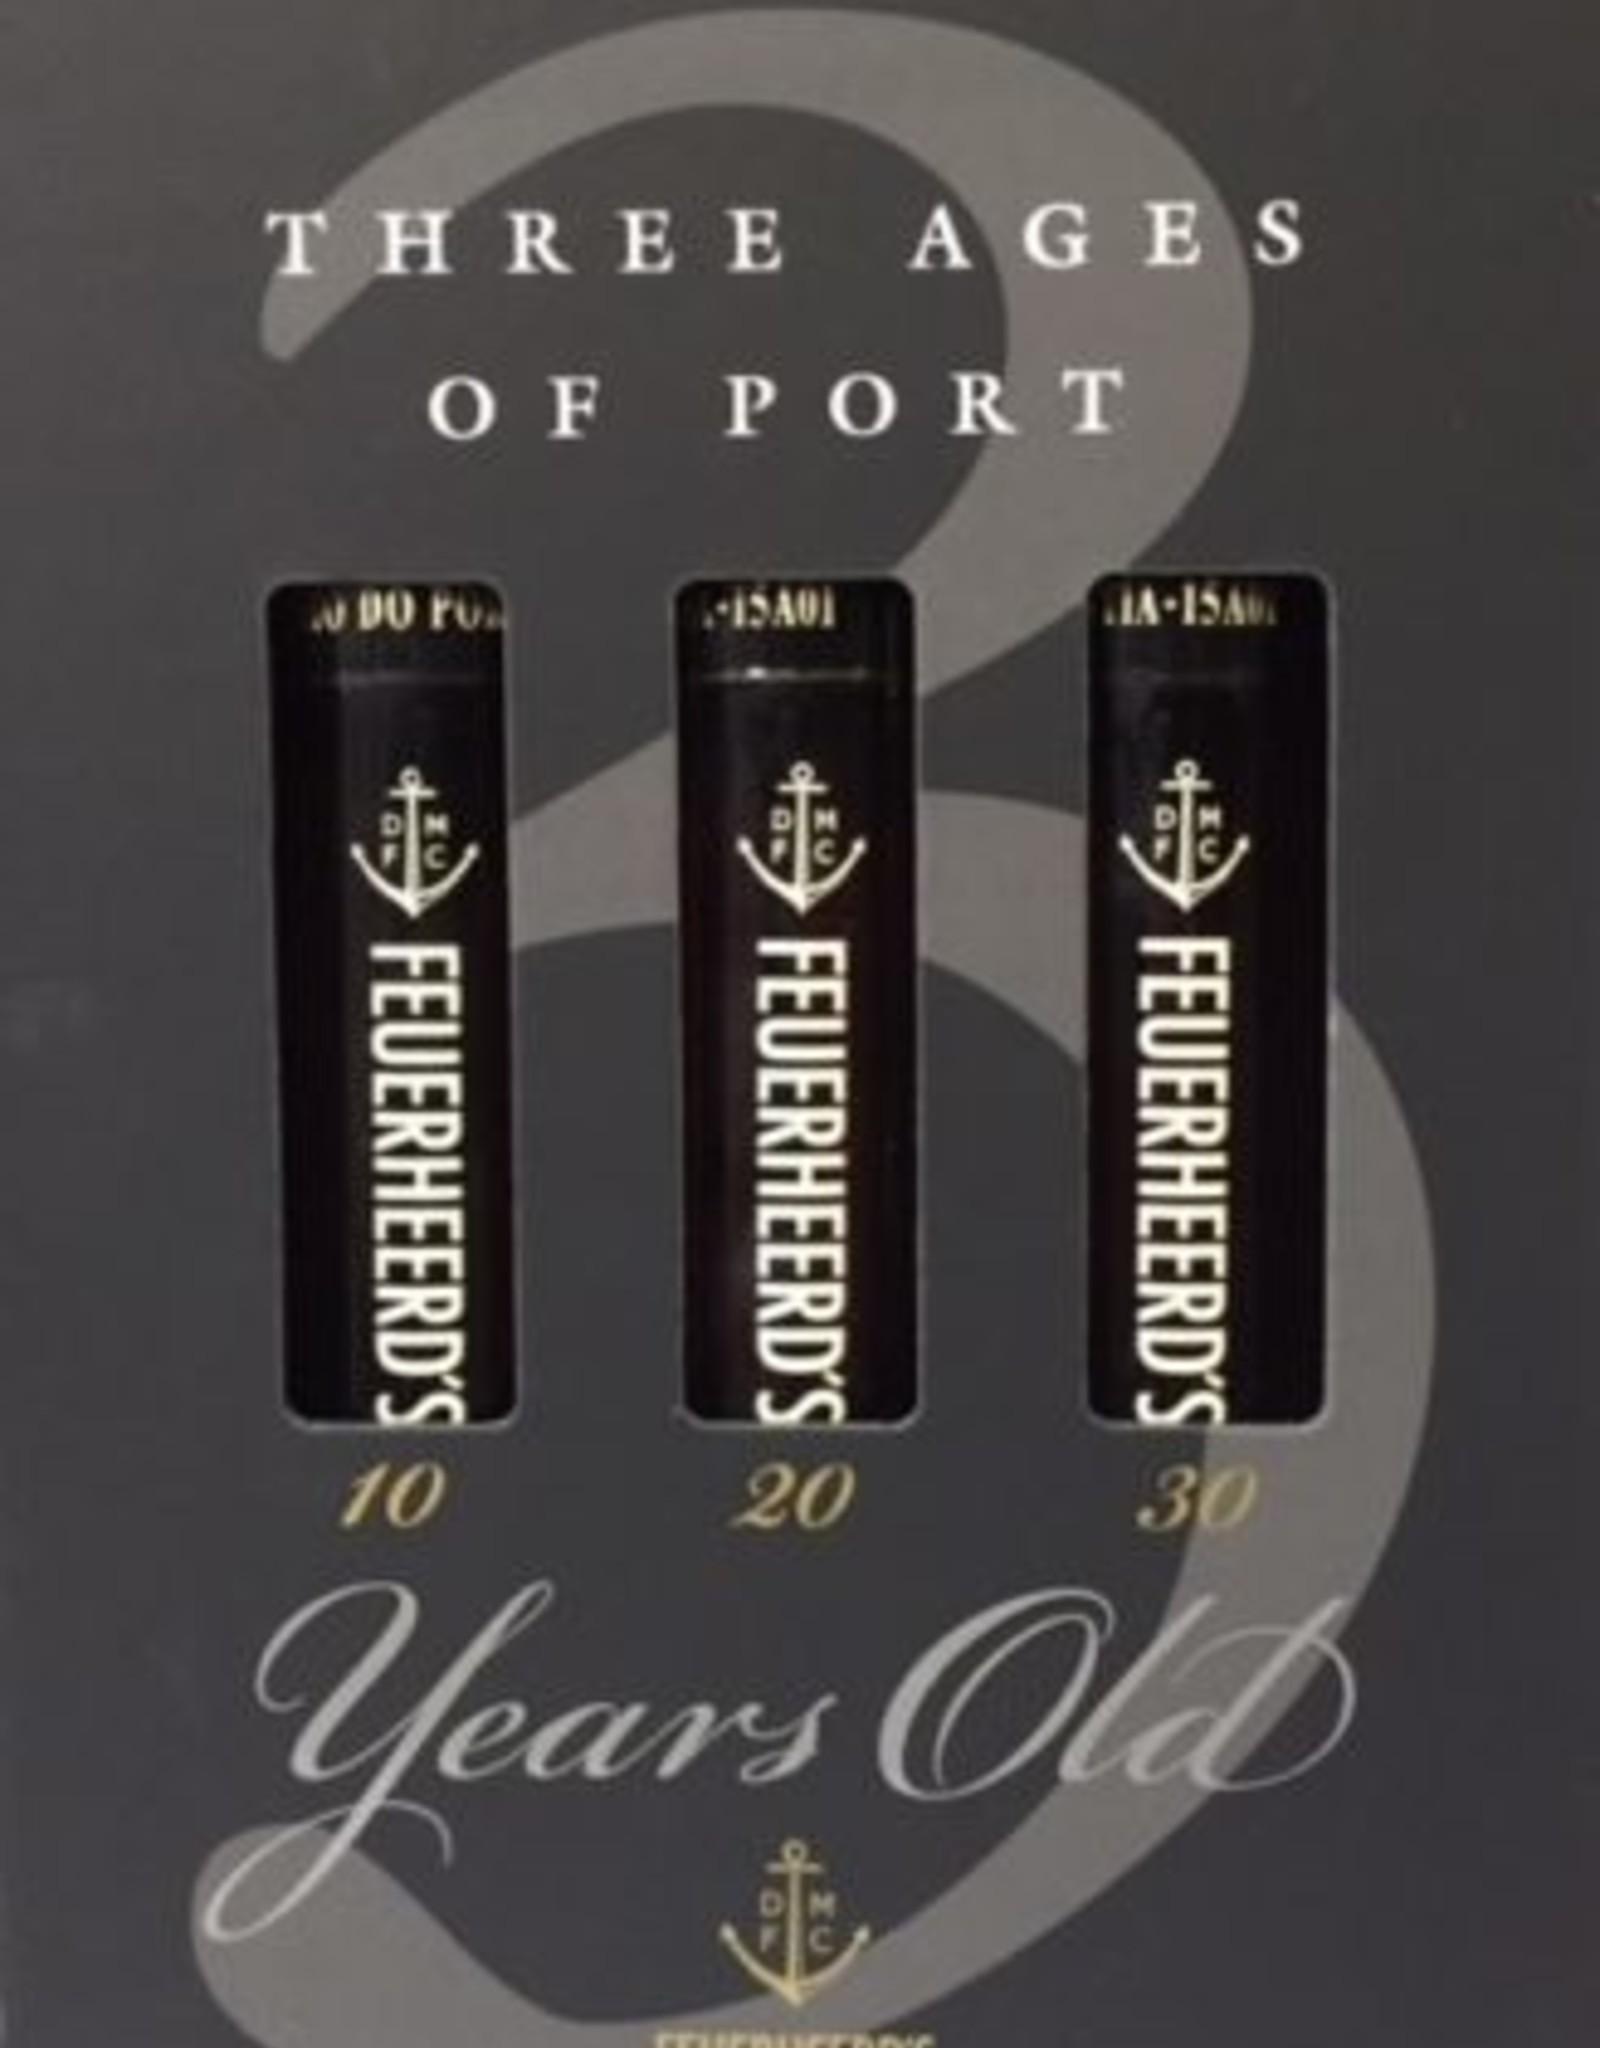 Three Ages of Port Gift Box Set, Feuerheerd's (3x50 ML Bottles)